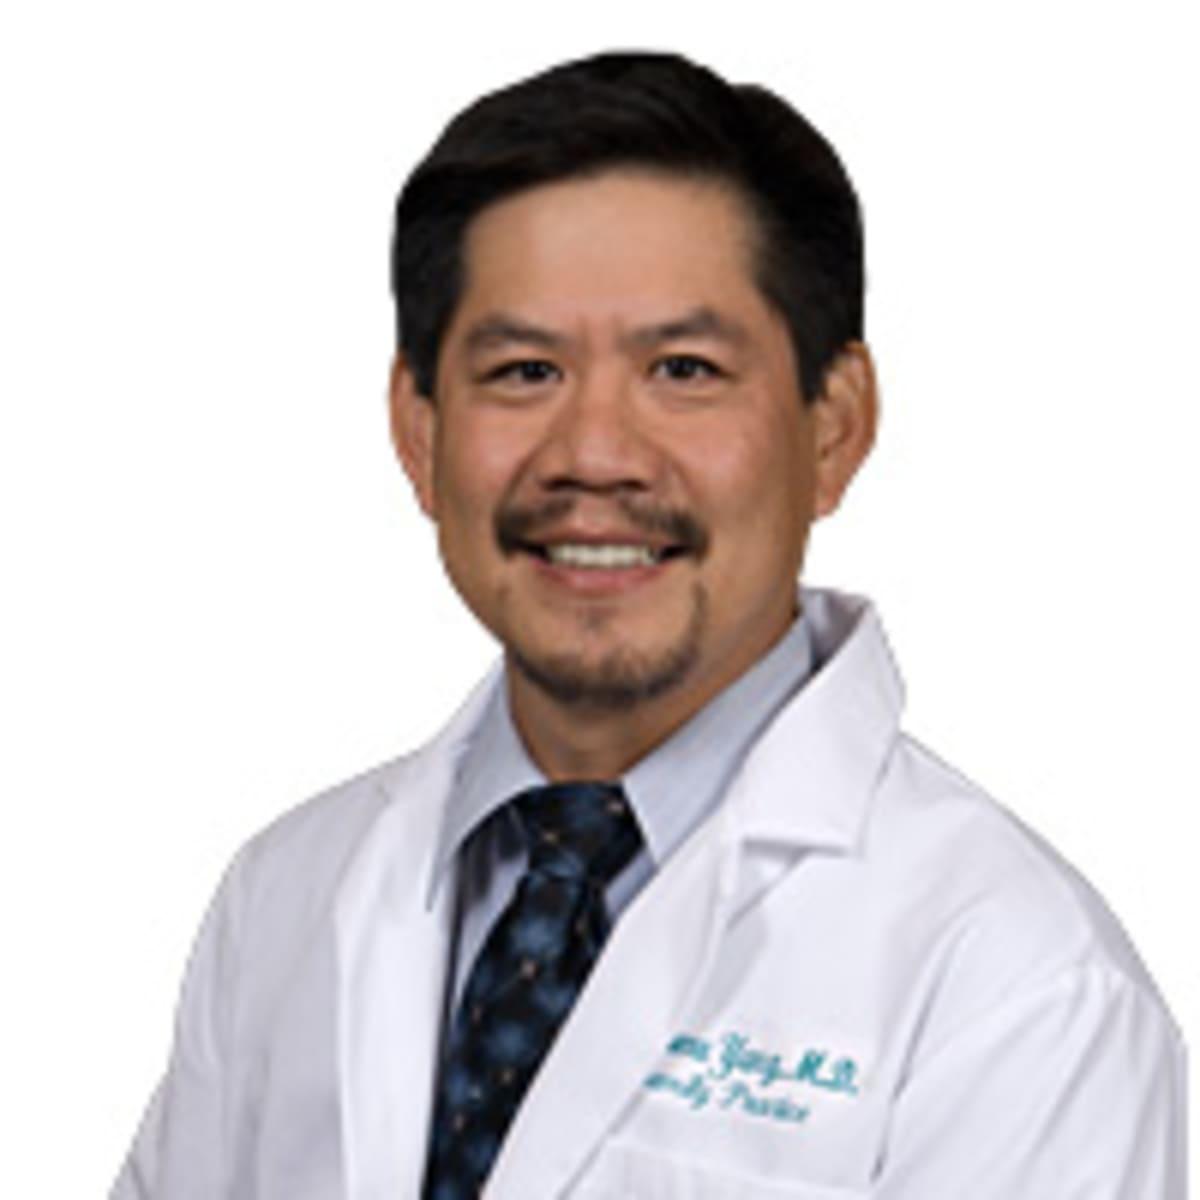 Dr. Andrew Yang, MD | Niceville, FL | Family Doctor Andrew Yang